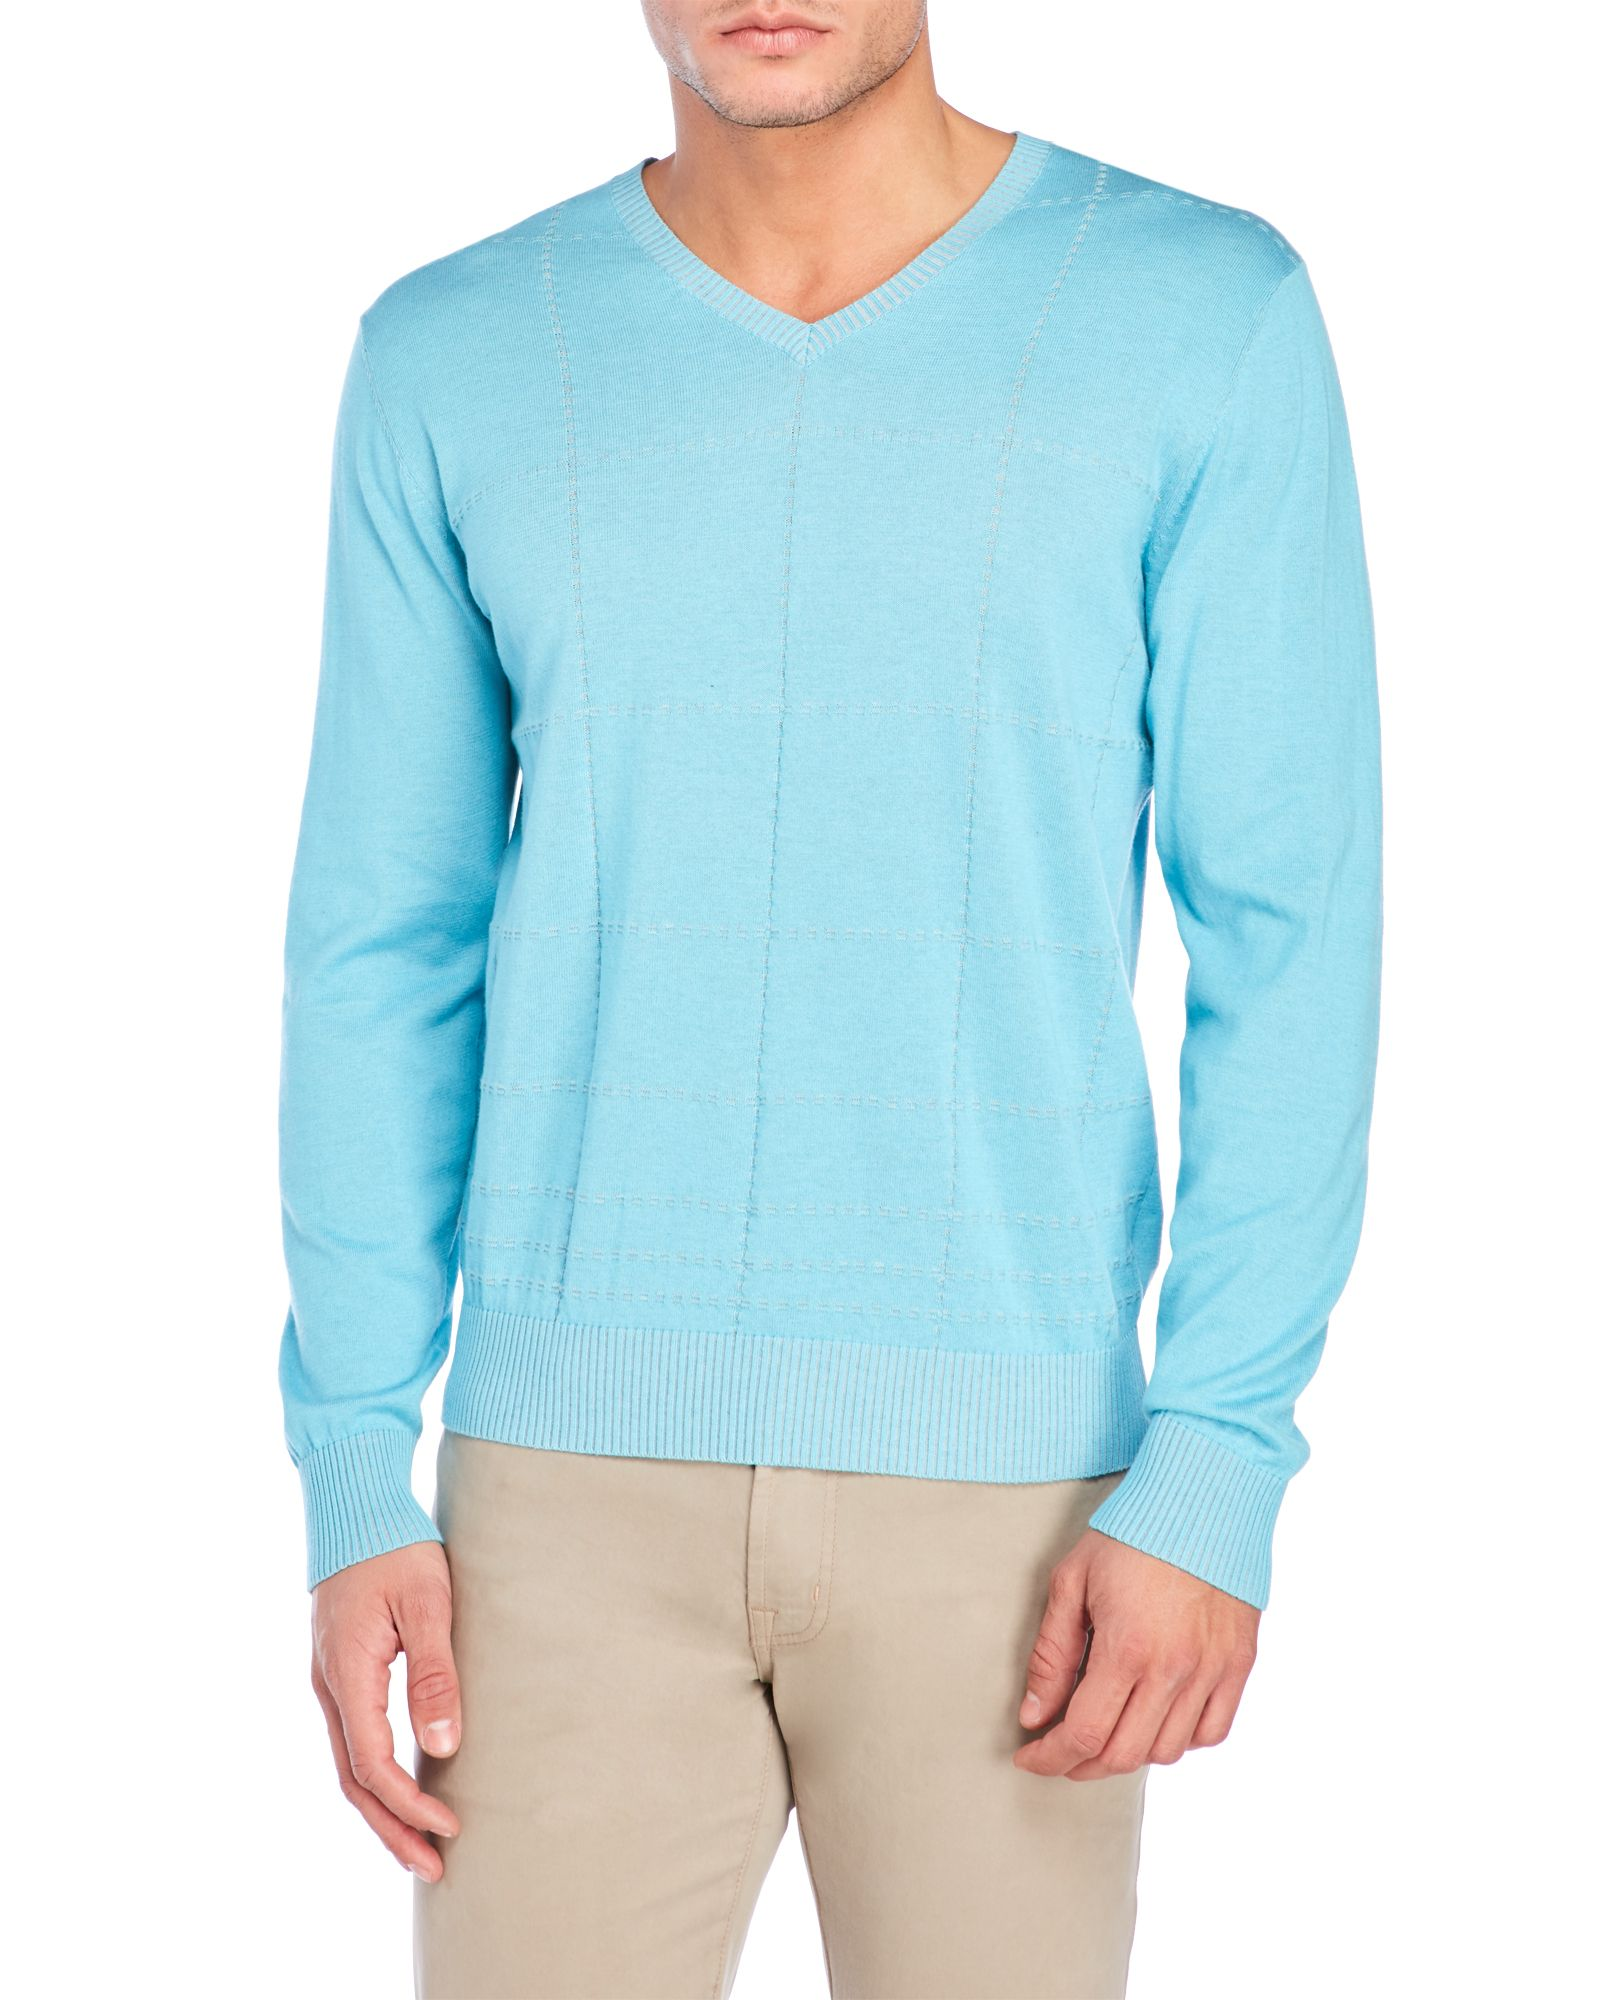 Raffi grid front vneck sweater apparel u accessories pinterest